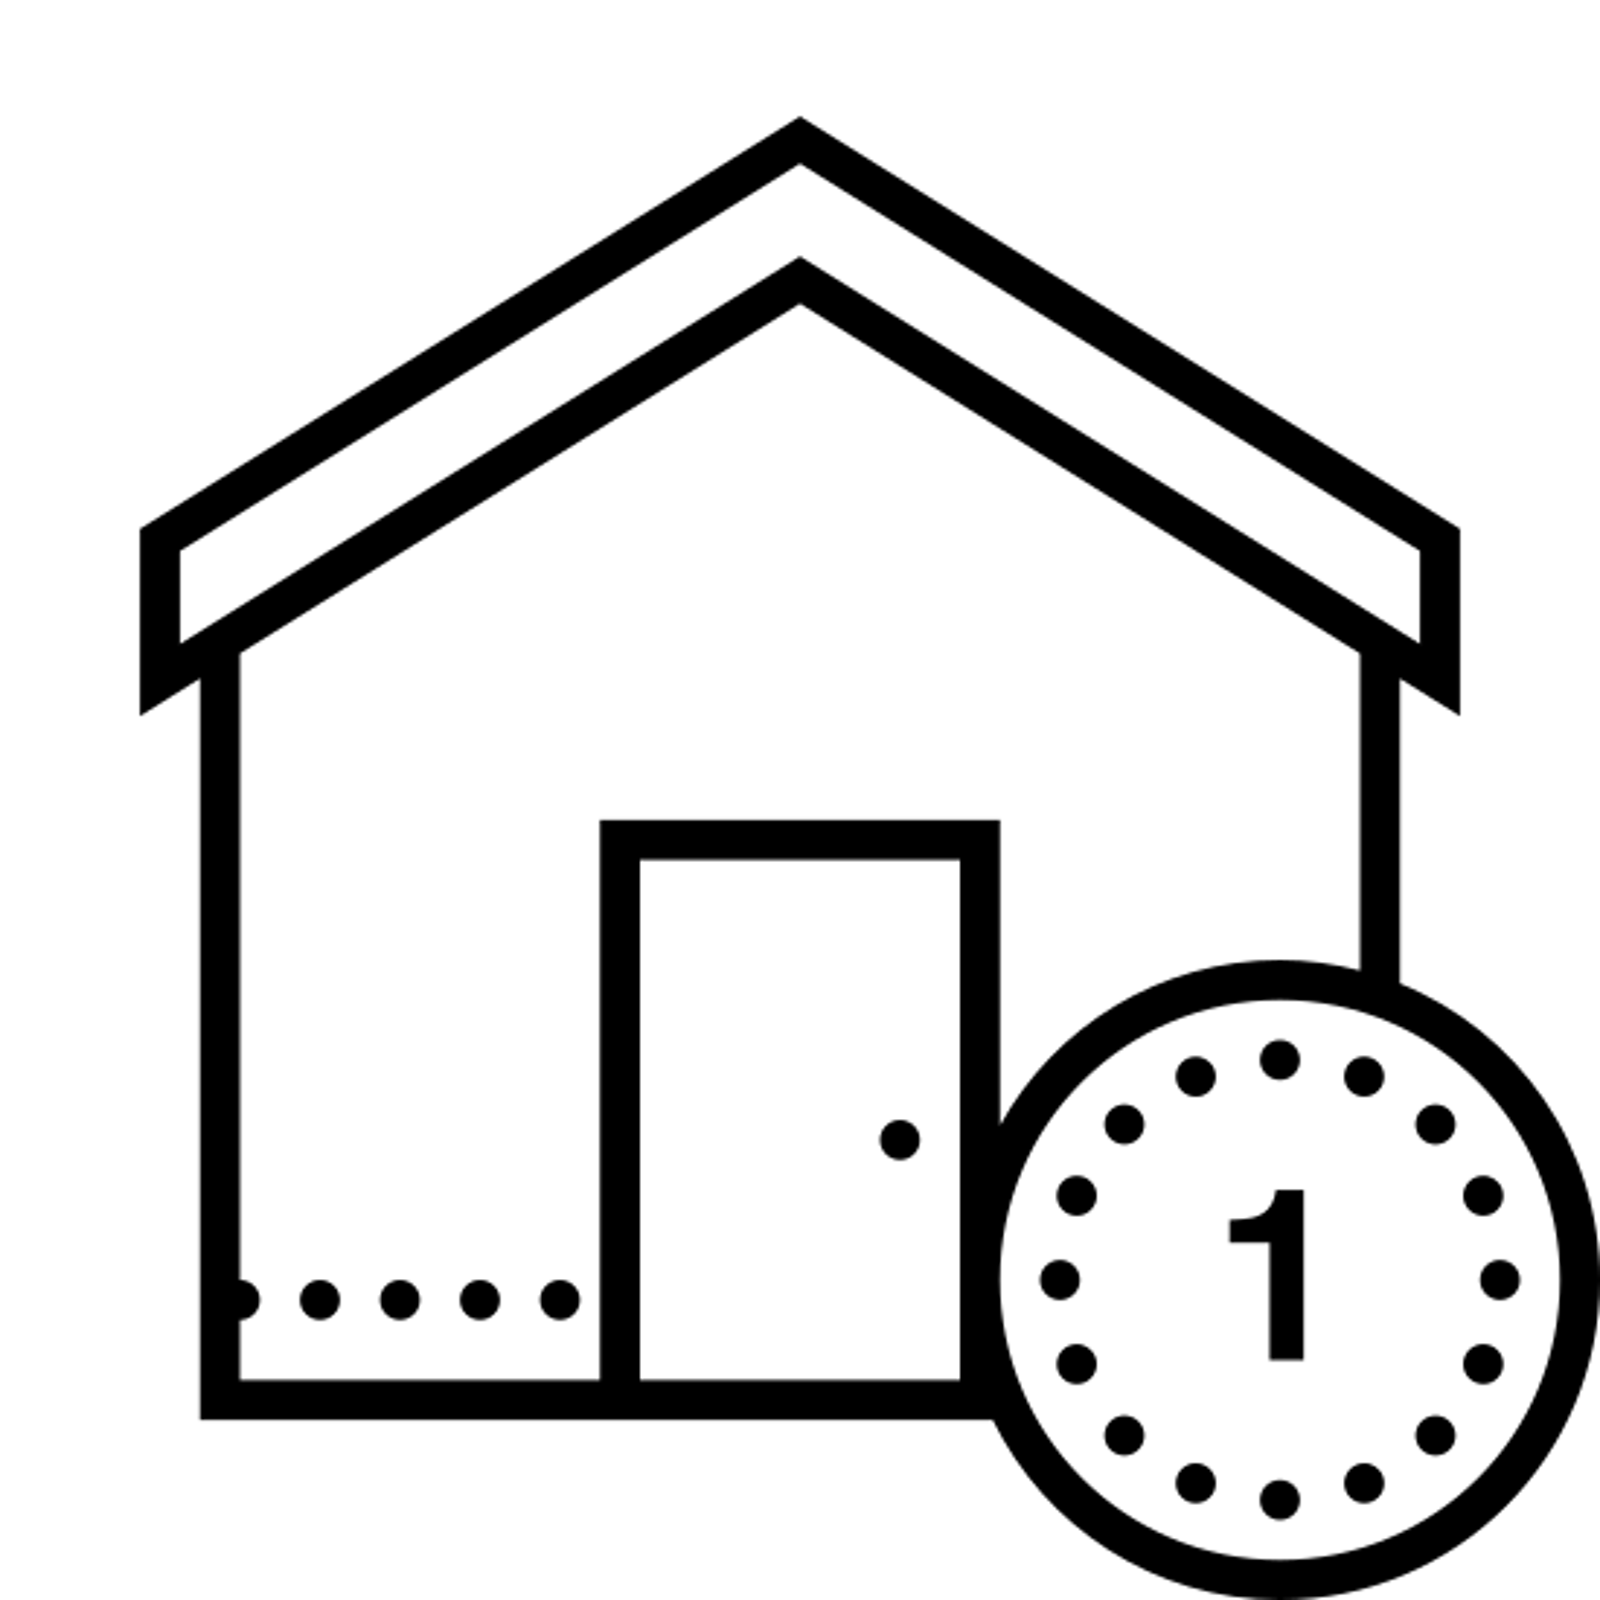 Hipoteka icon